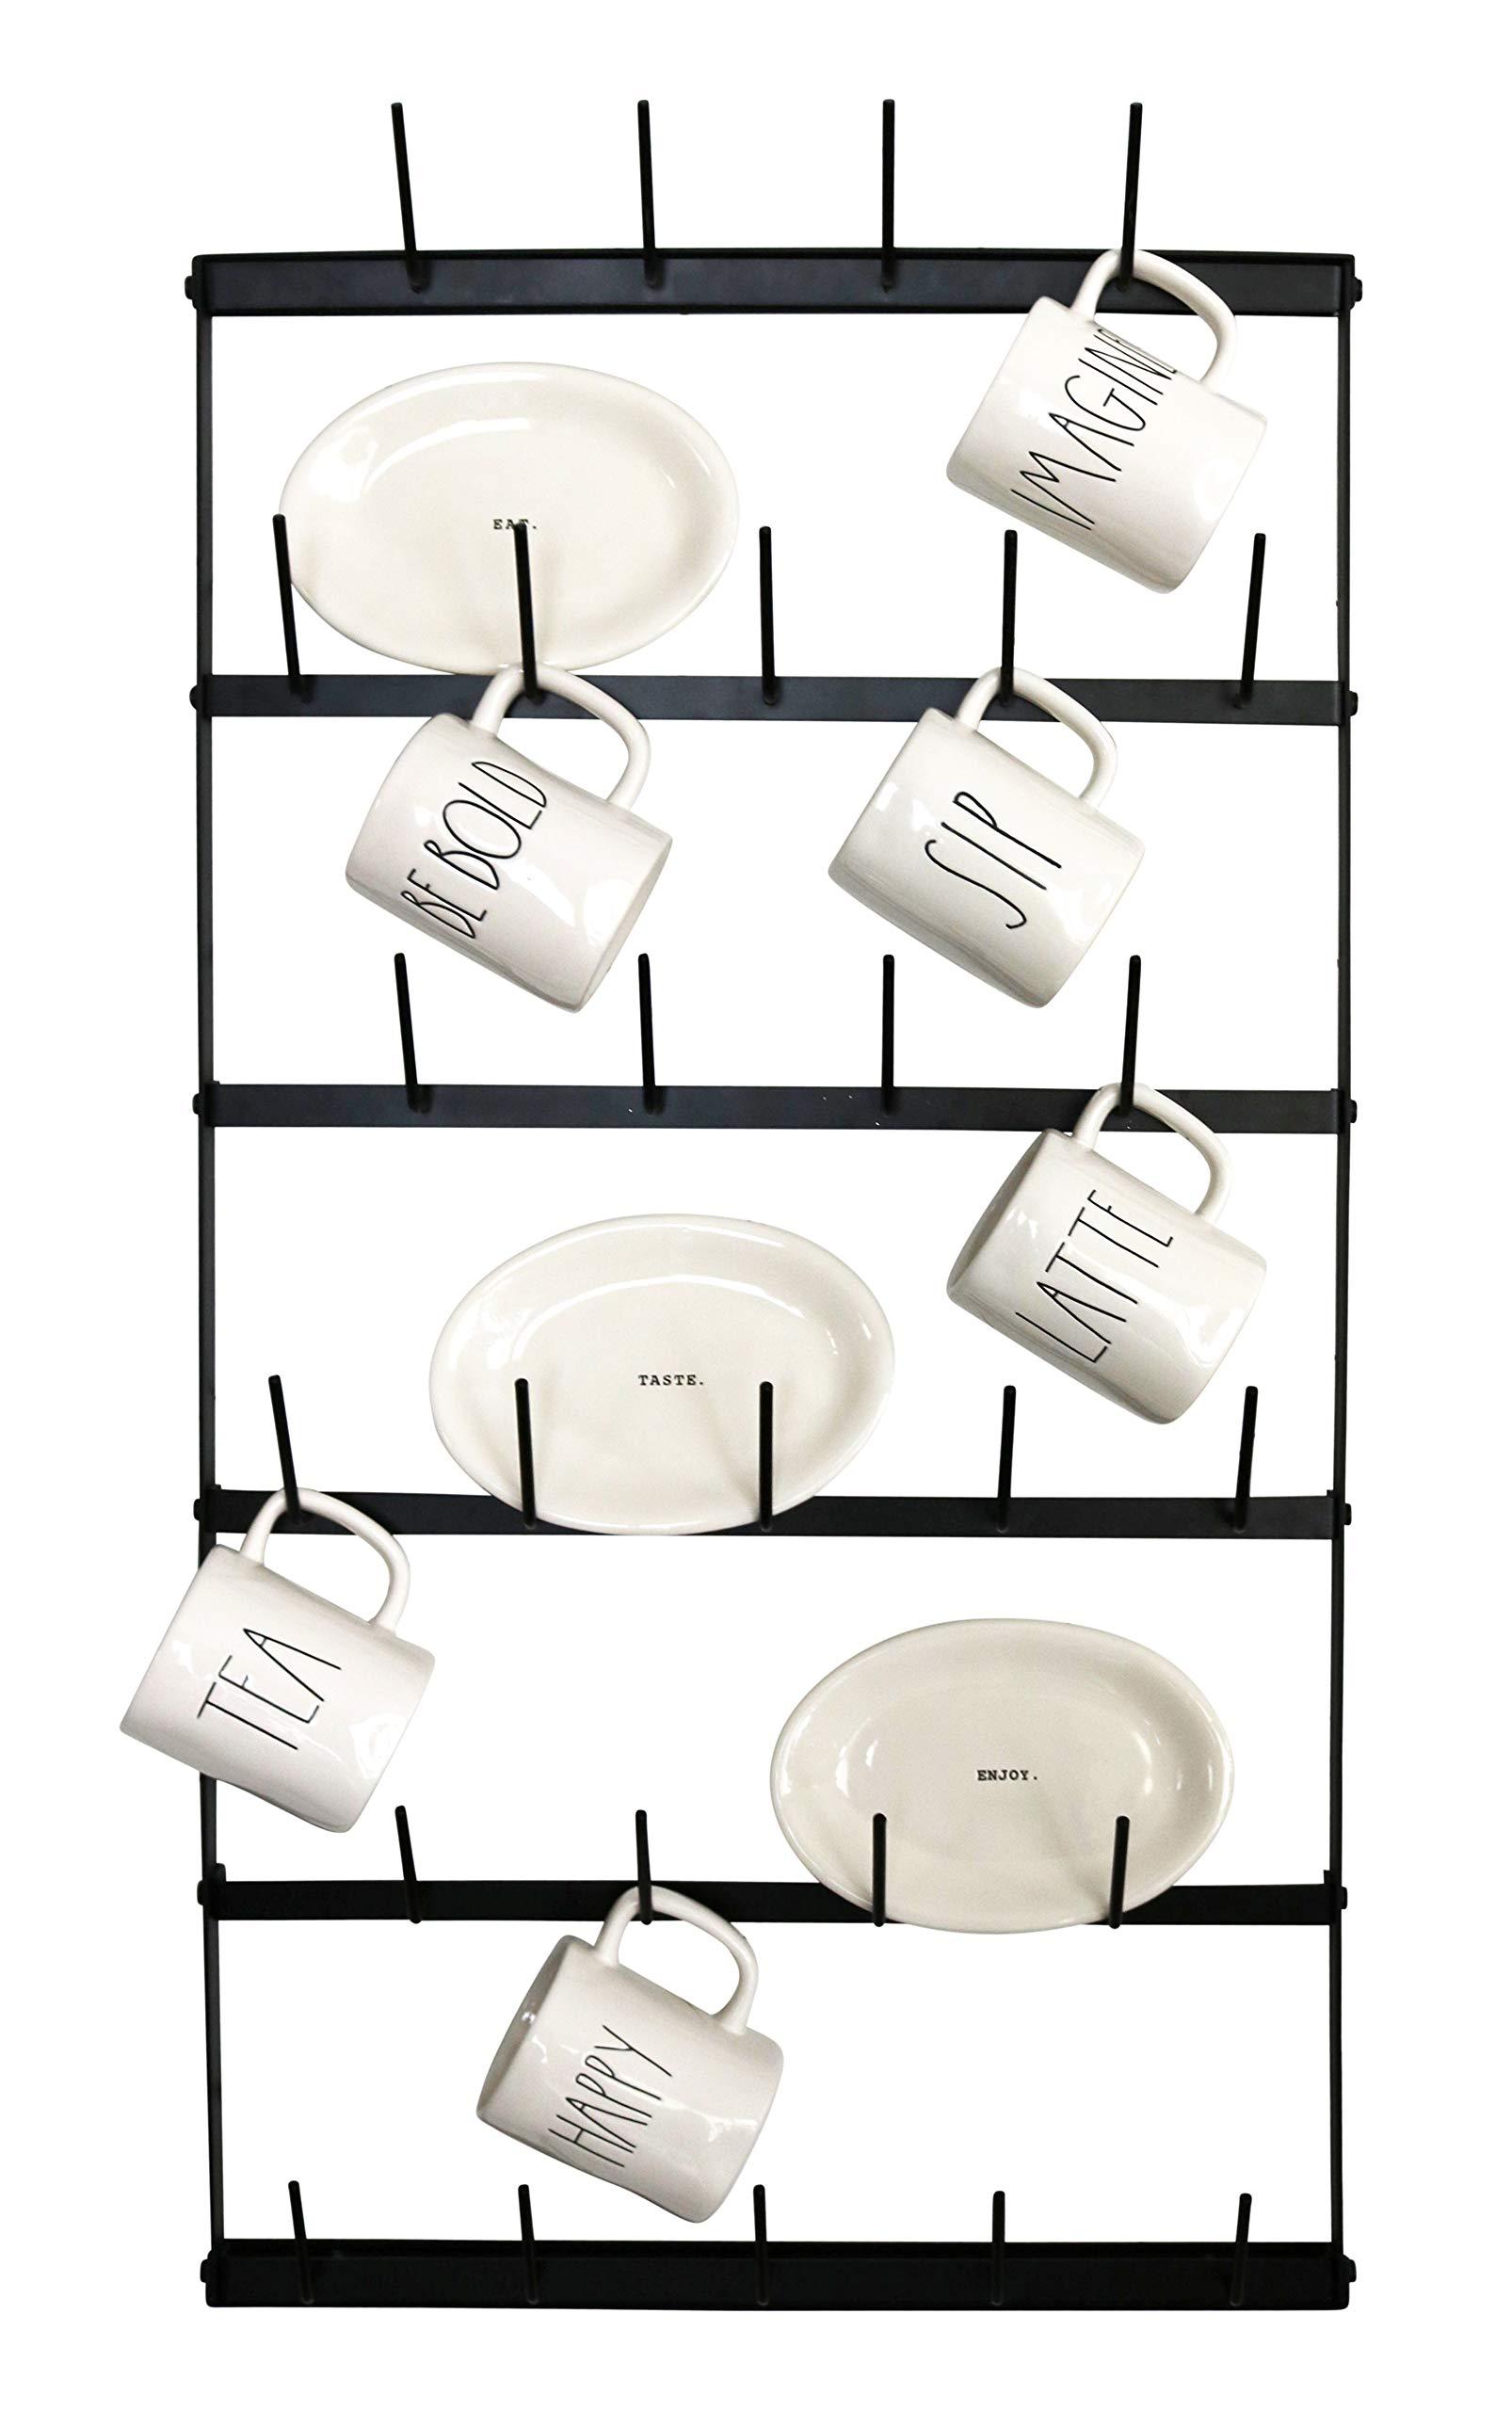 Metal Coffee Mug Rack - Large 6 Row Wall Mounted Storage Display Organizer Rack For Coffee Mugs, Tea Cups, Mason Jars, and More. (38'' x 20.5'' x 3'') by Claimed Corner